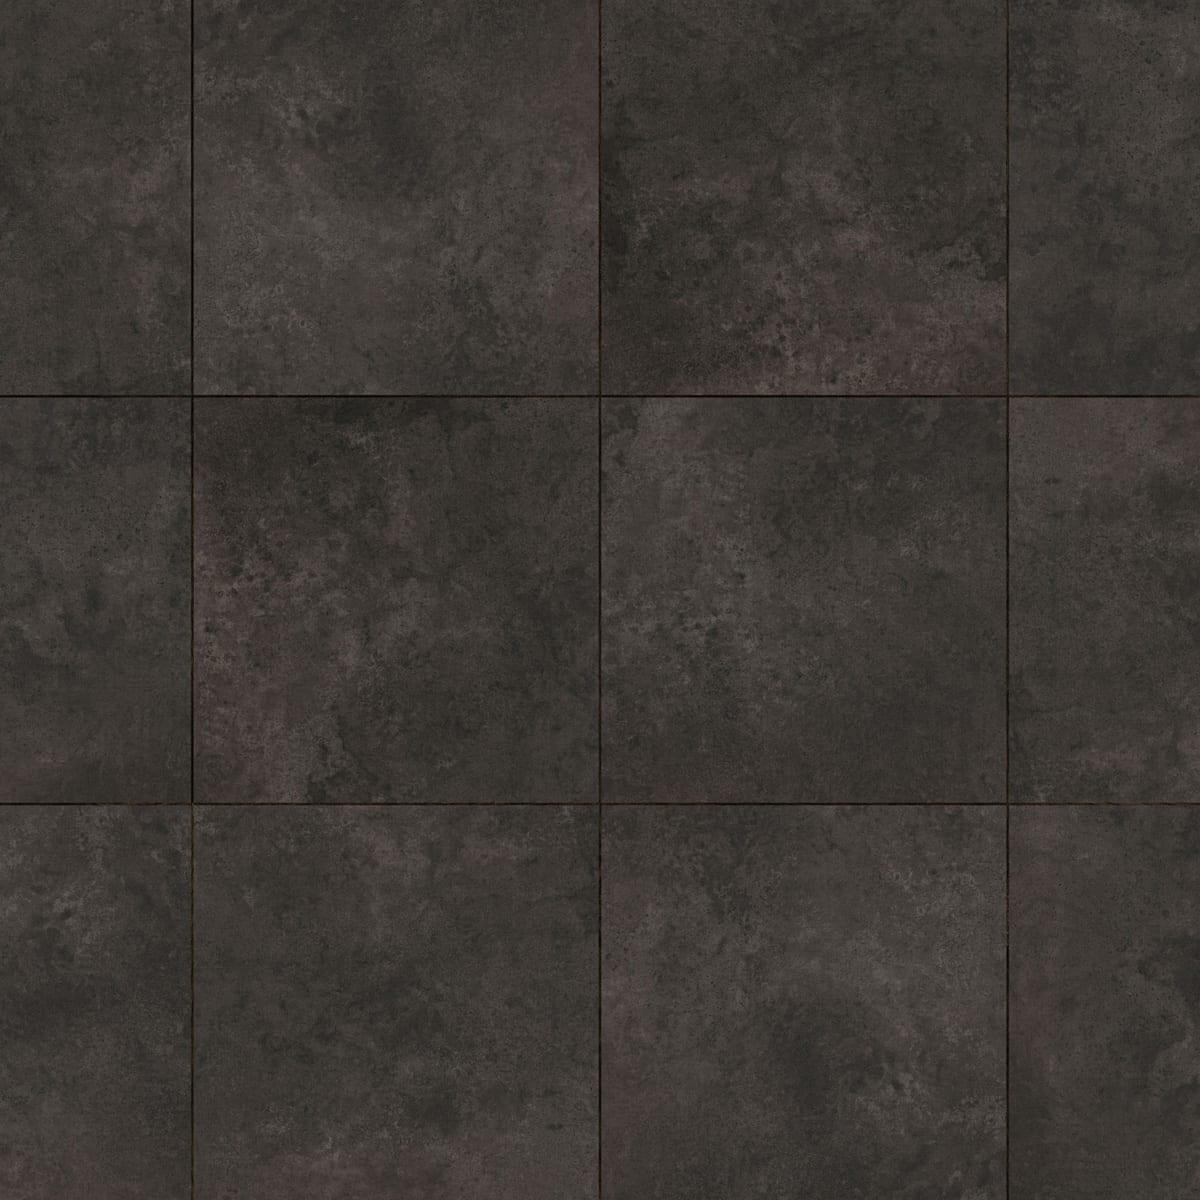 karndean opus stone vinyl tile flooring